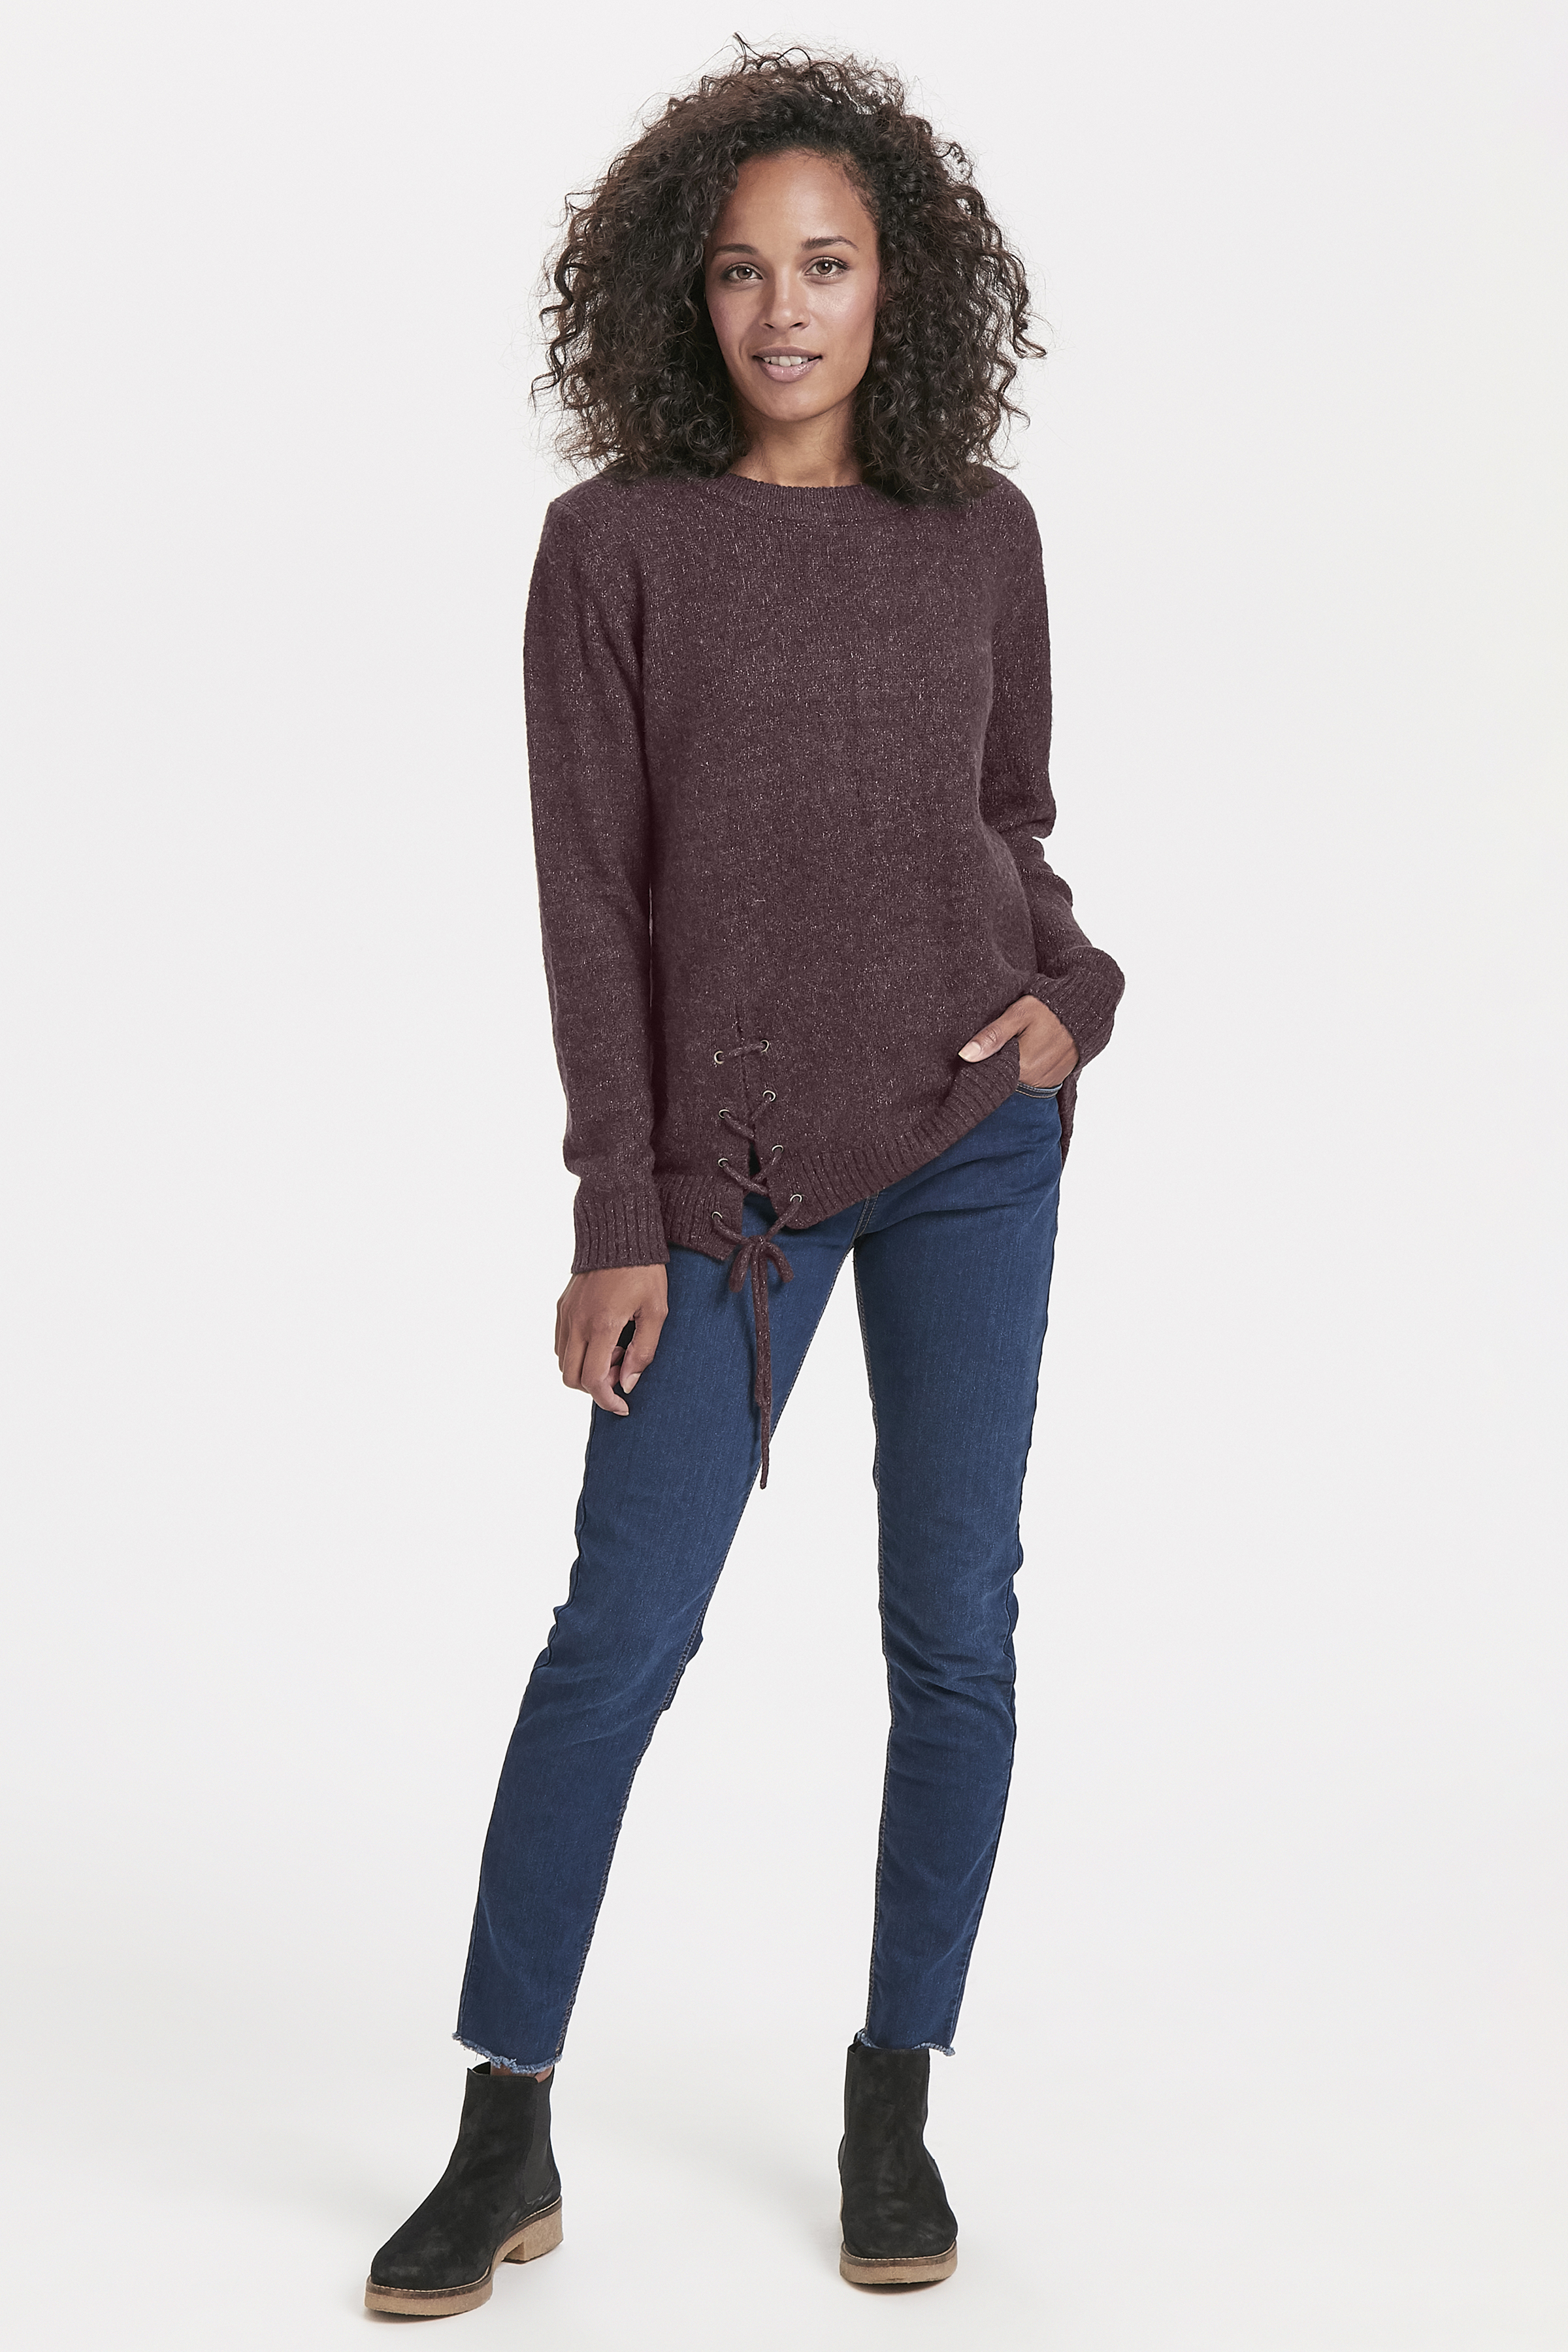 Aubergine Stickad tröja från Bon'A Parte – Köp Aubergine Stickad tröja från stl. S-2XL här